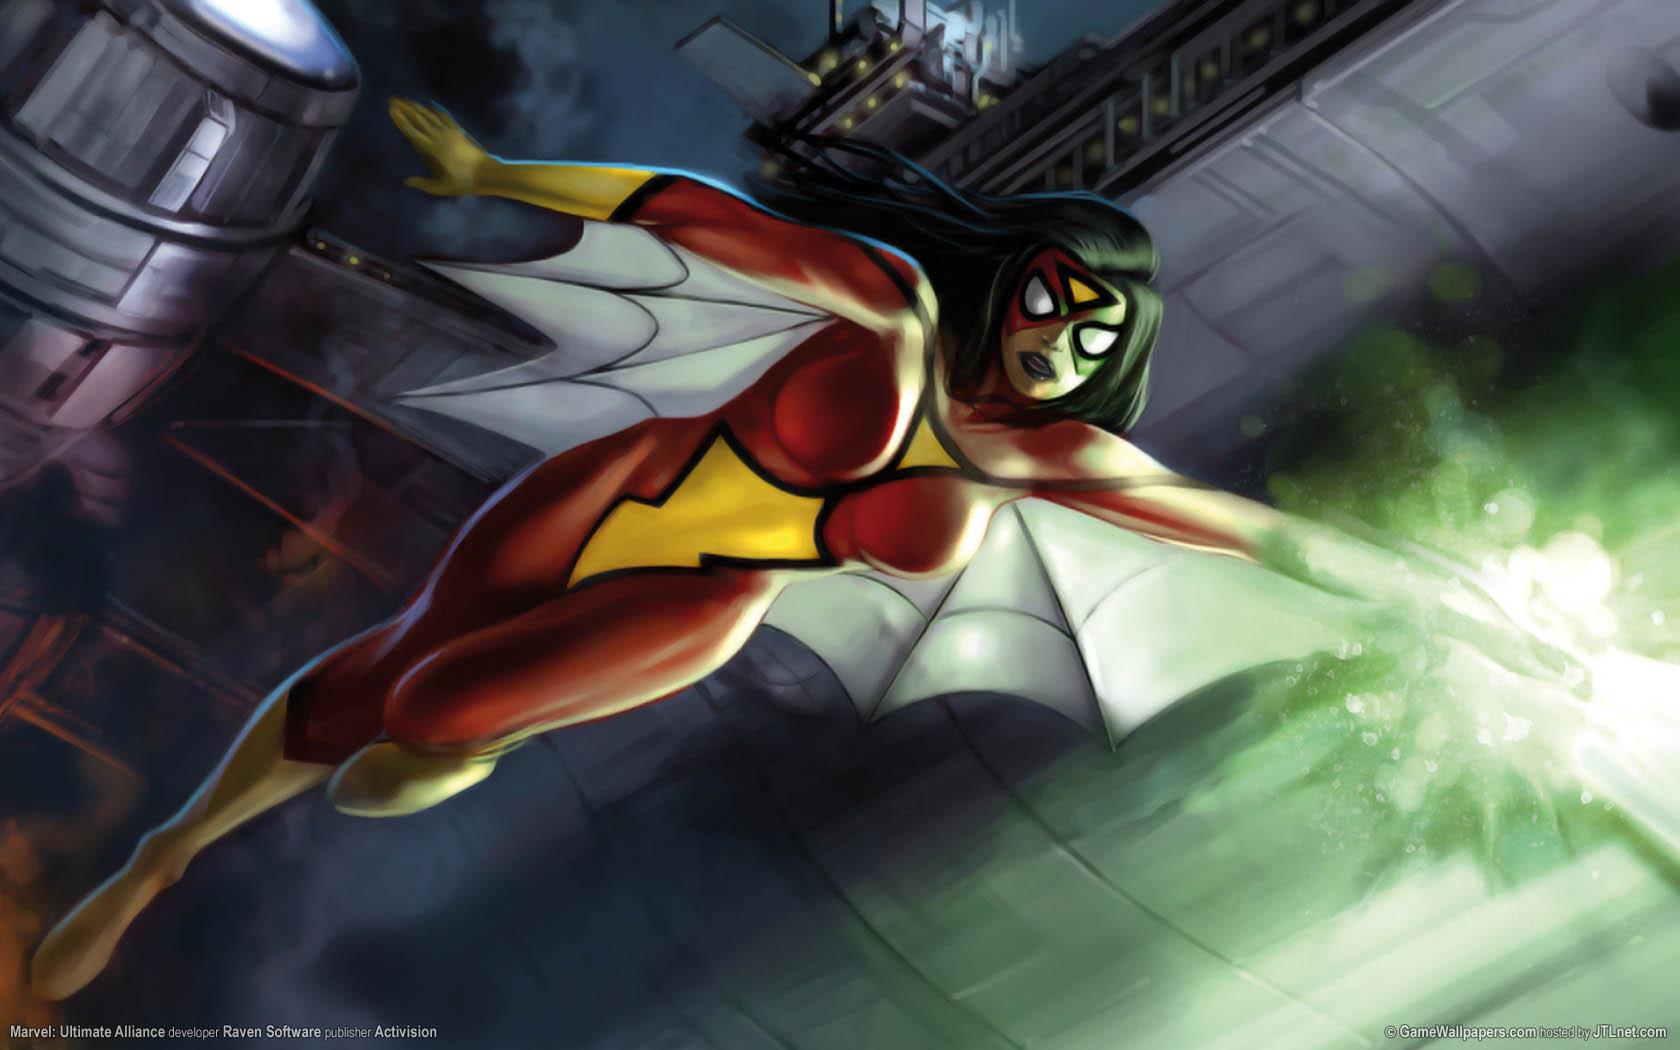 Marvel: Ultimate Alliance Hintergrundbild 05 1680x1050